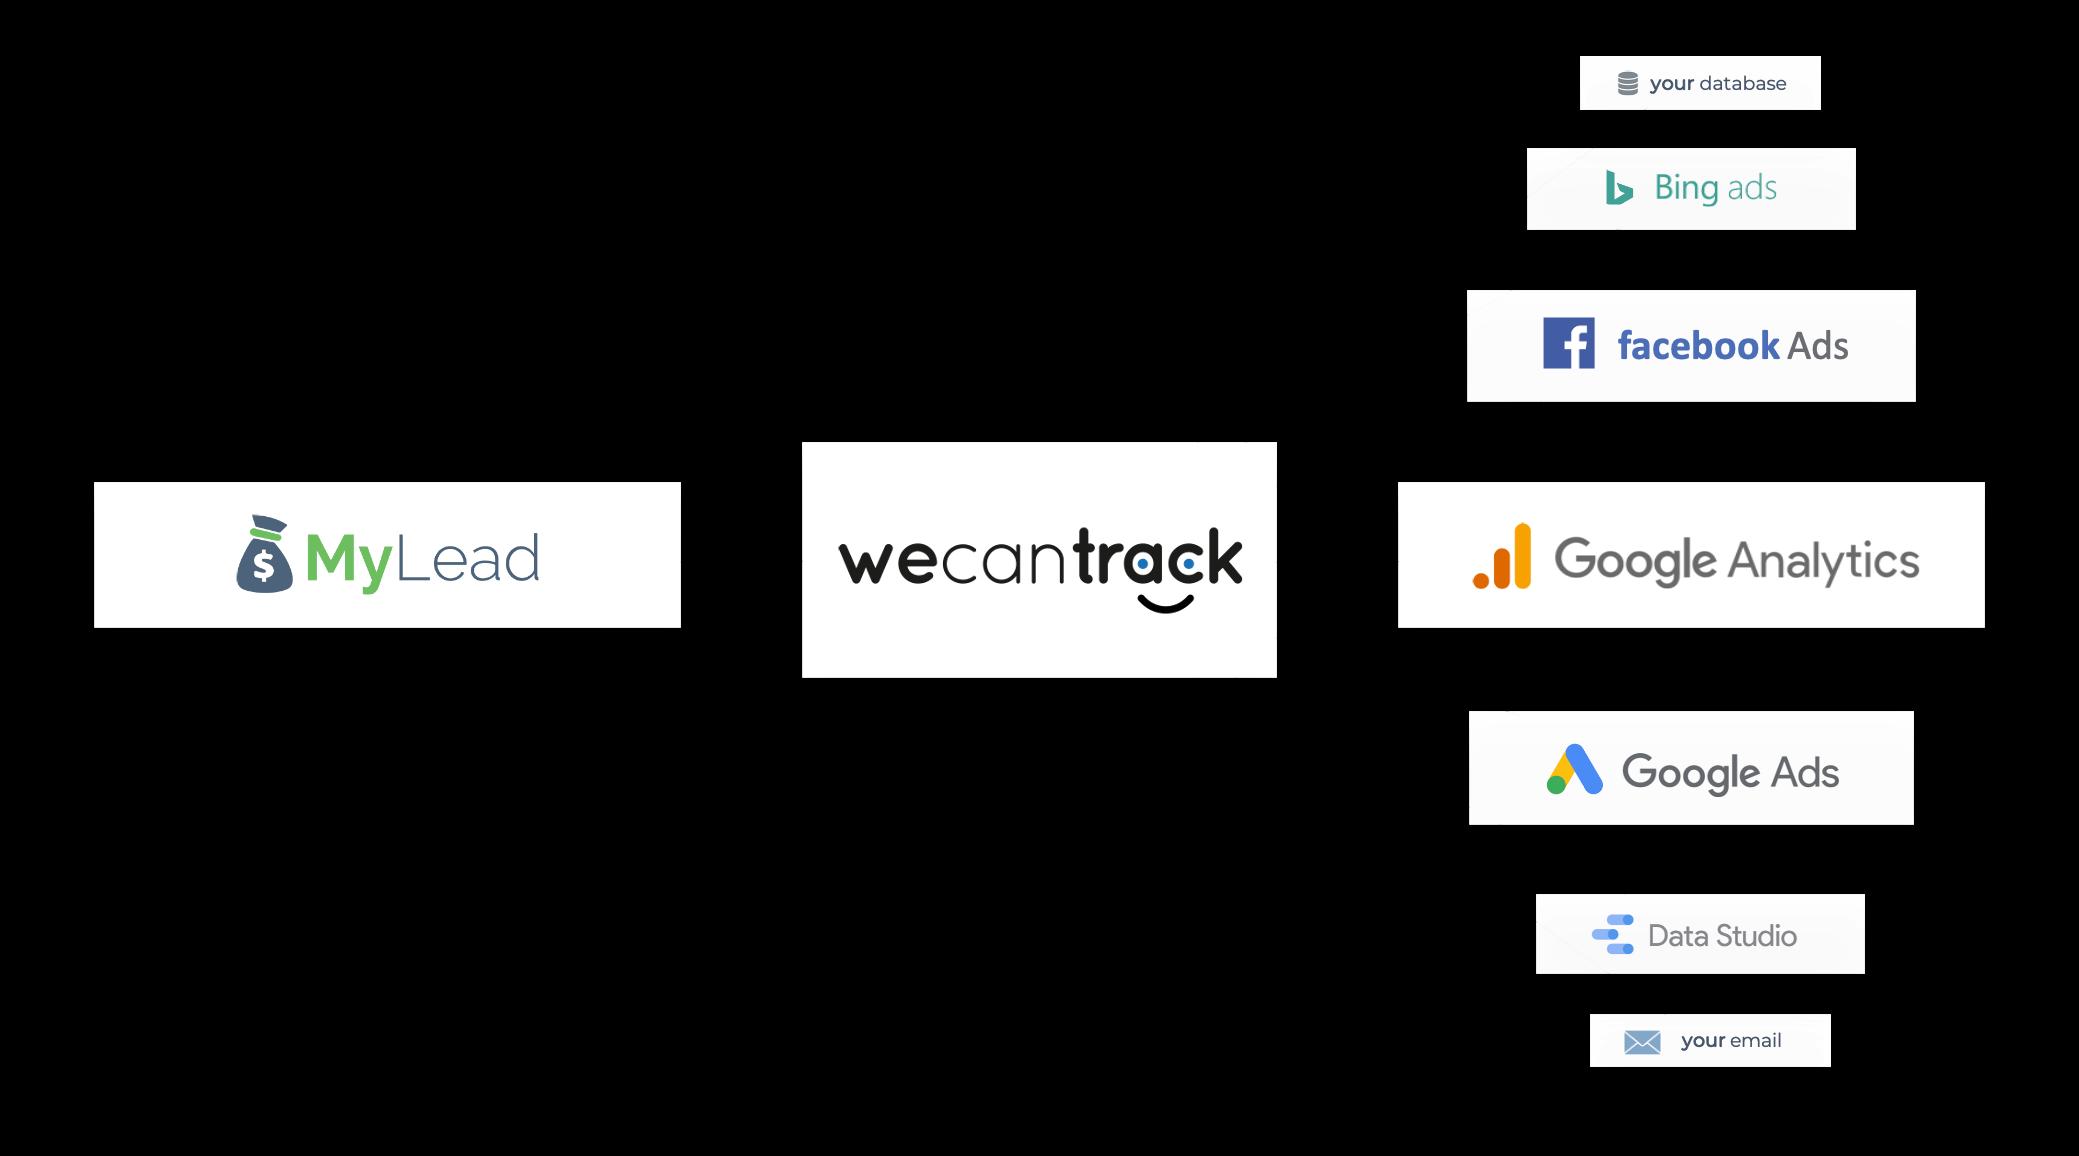 mylead-affiliate-conversion-data-integration-via-postback-url